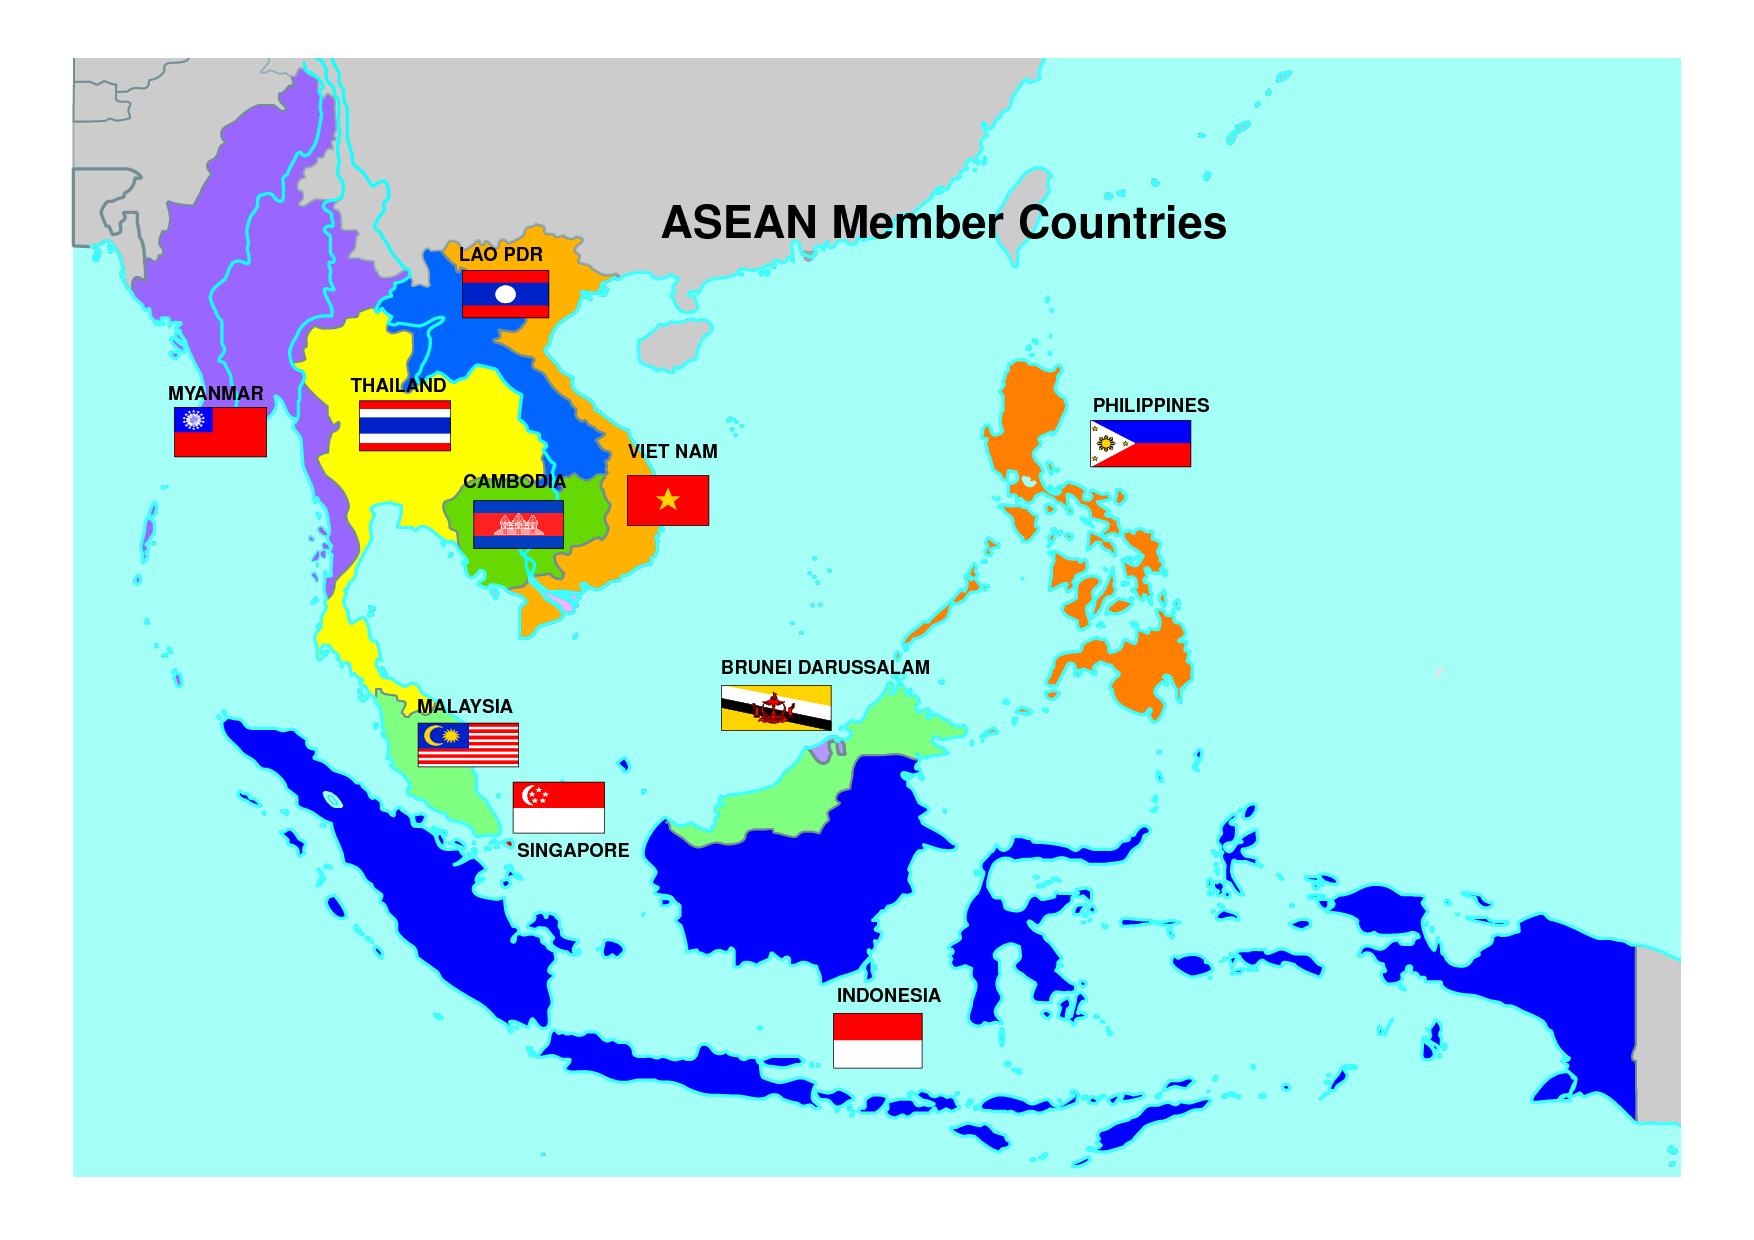 ASEAN's Geopolitical Arrangement Visàvis The Chinese